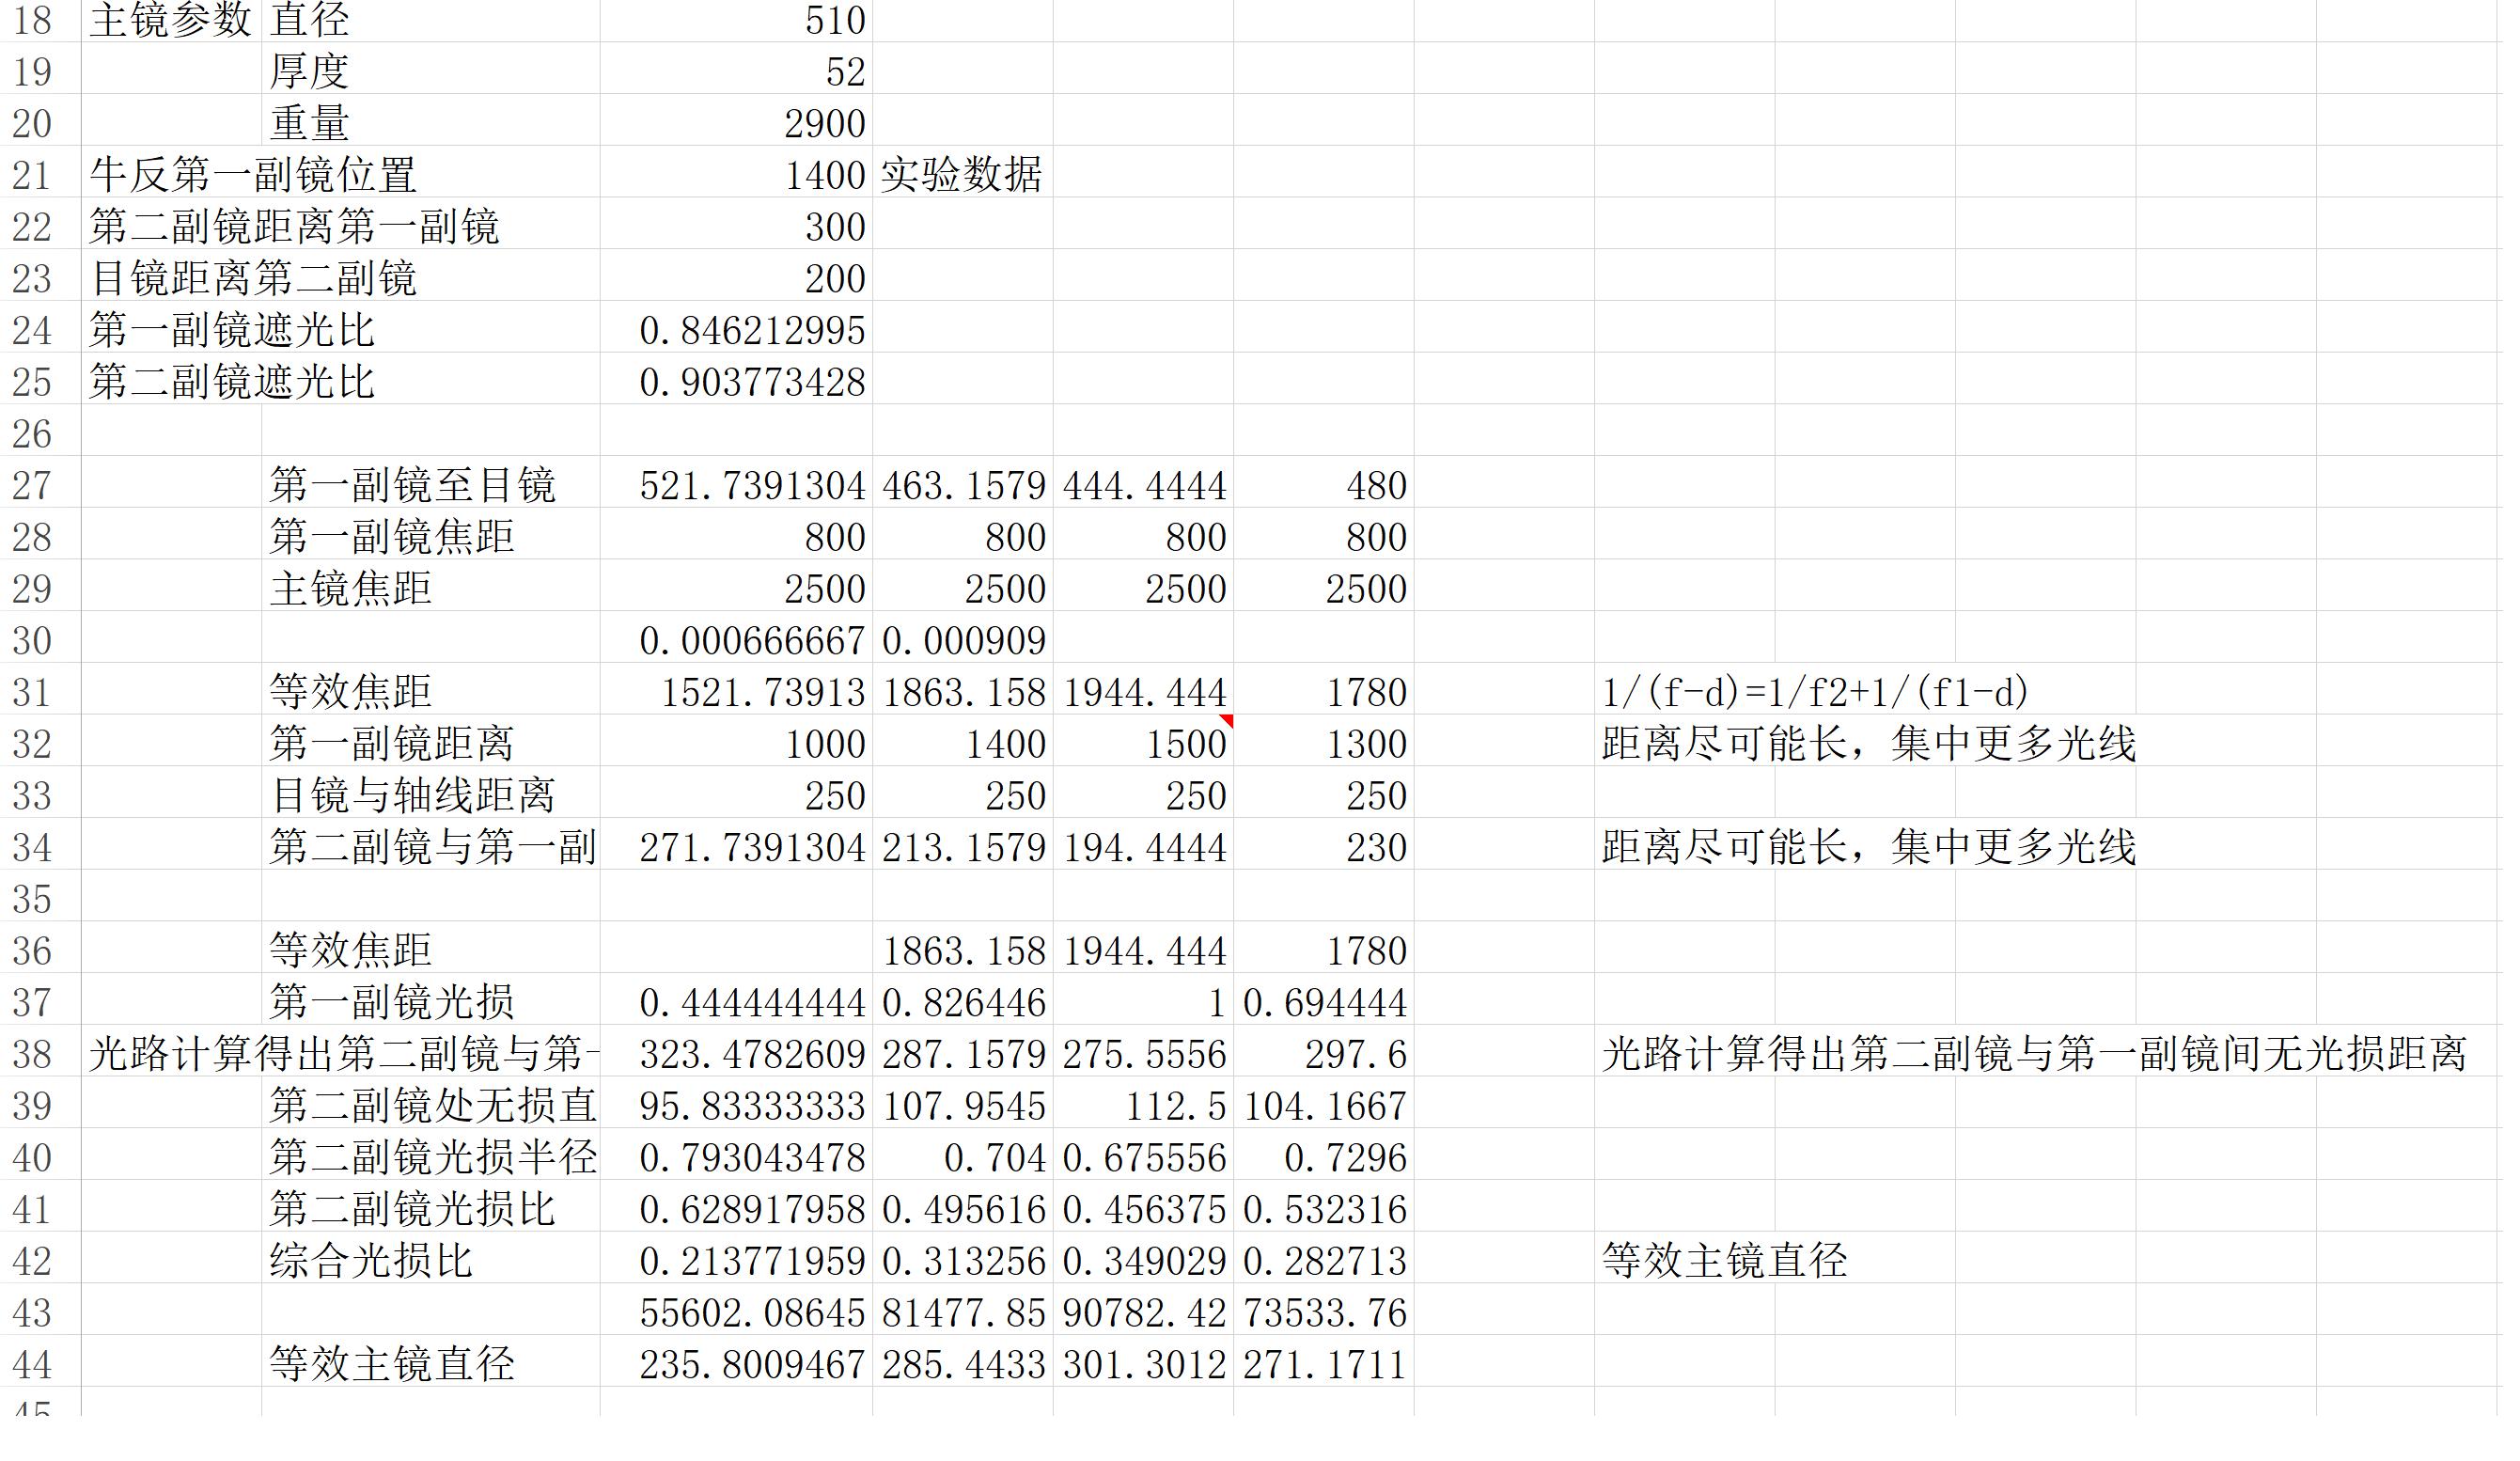 2片副镜计算图.png